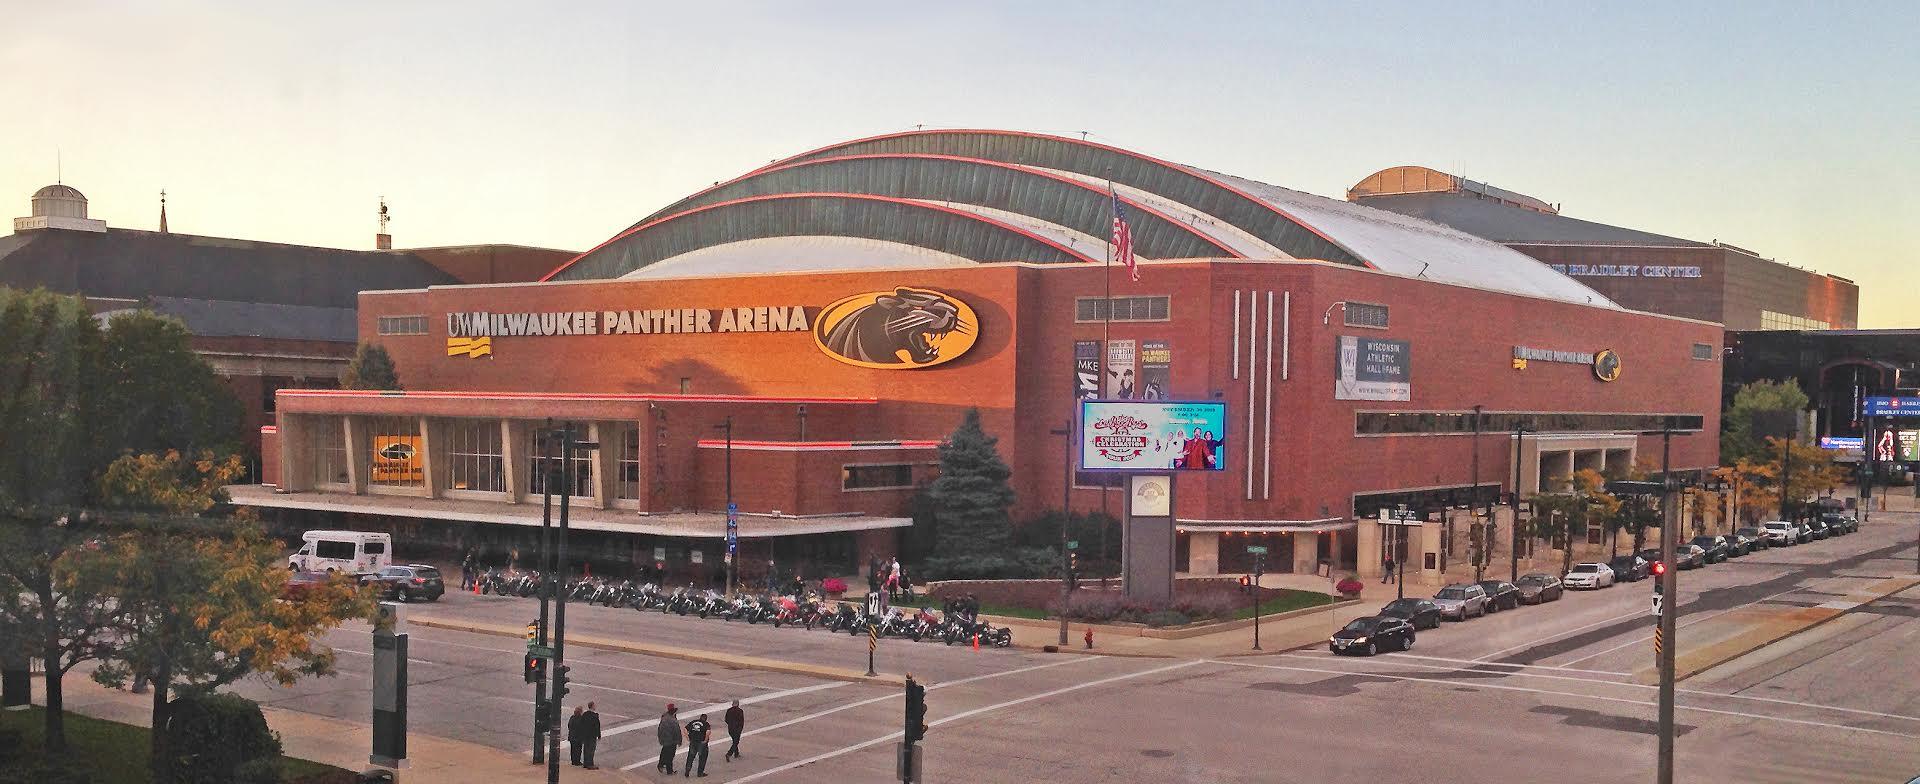 UWM-Panther Arena